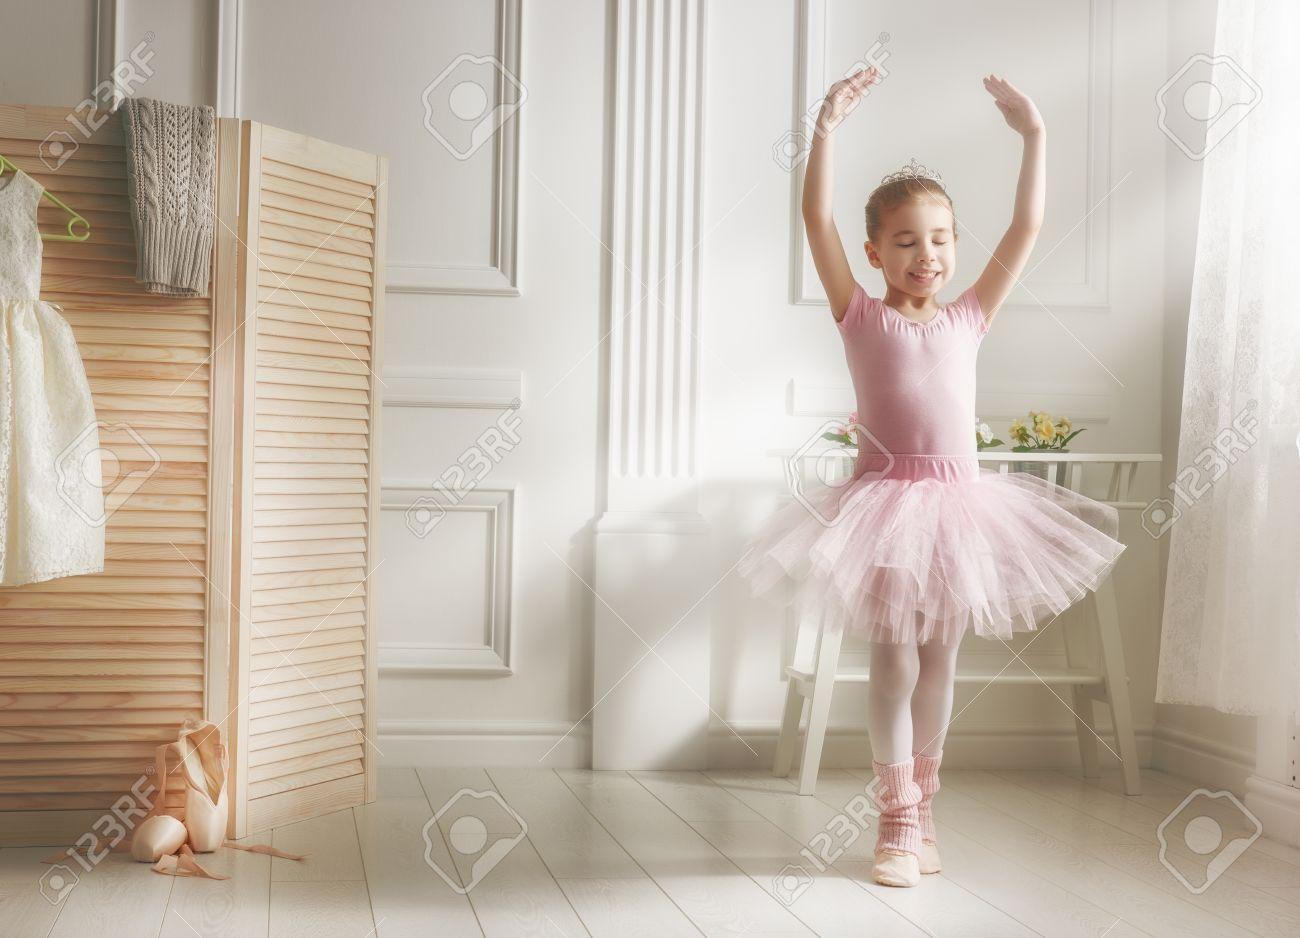 c6176e5b0551 Cute Little Girl Dreams Of Becoming A Ballerina. Child Girl In ...